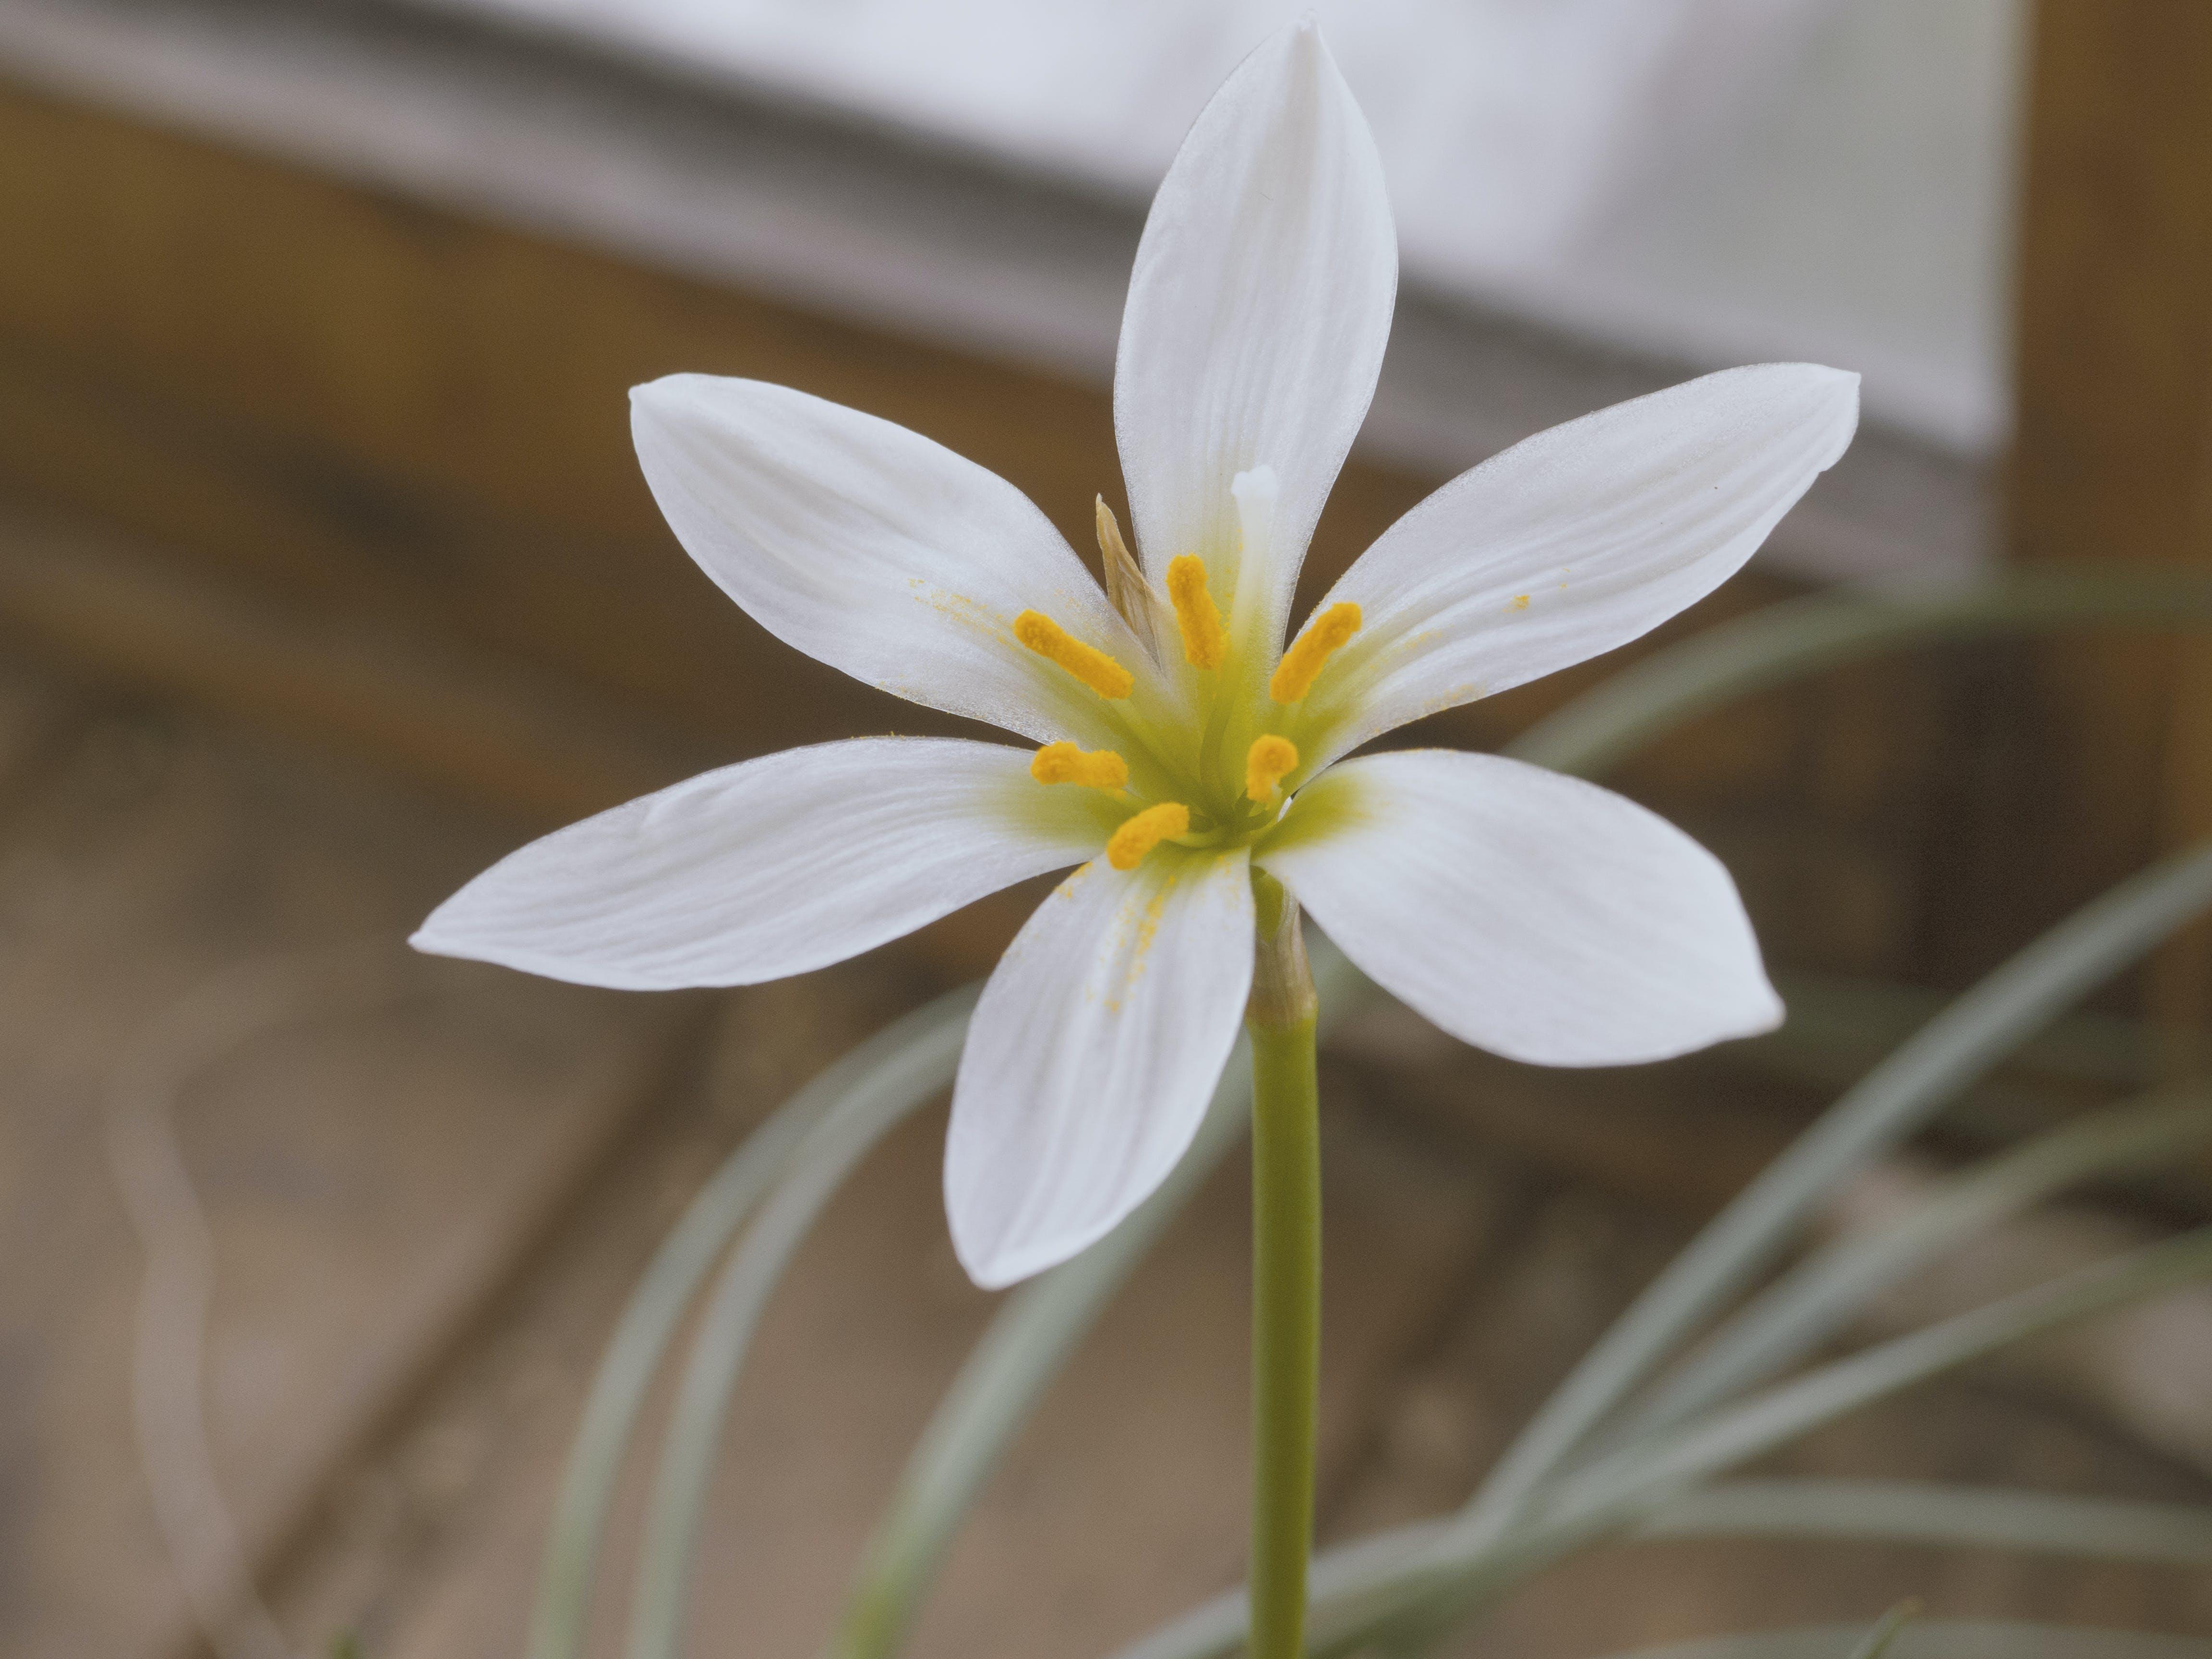 Selective Focus Photo of White Rain Lily